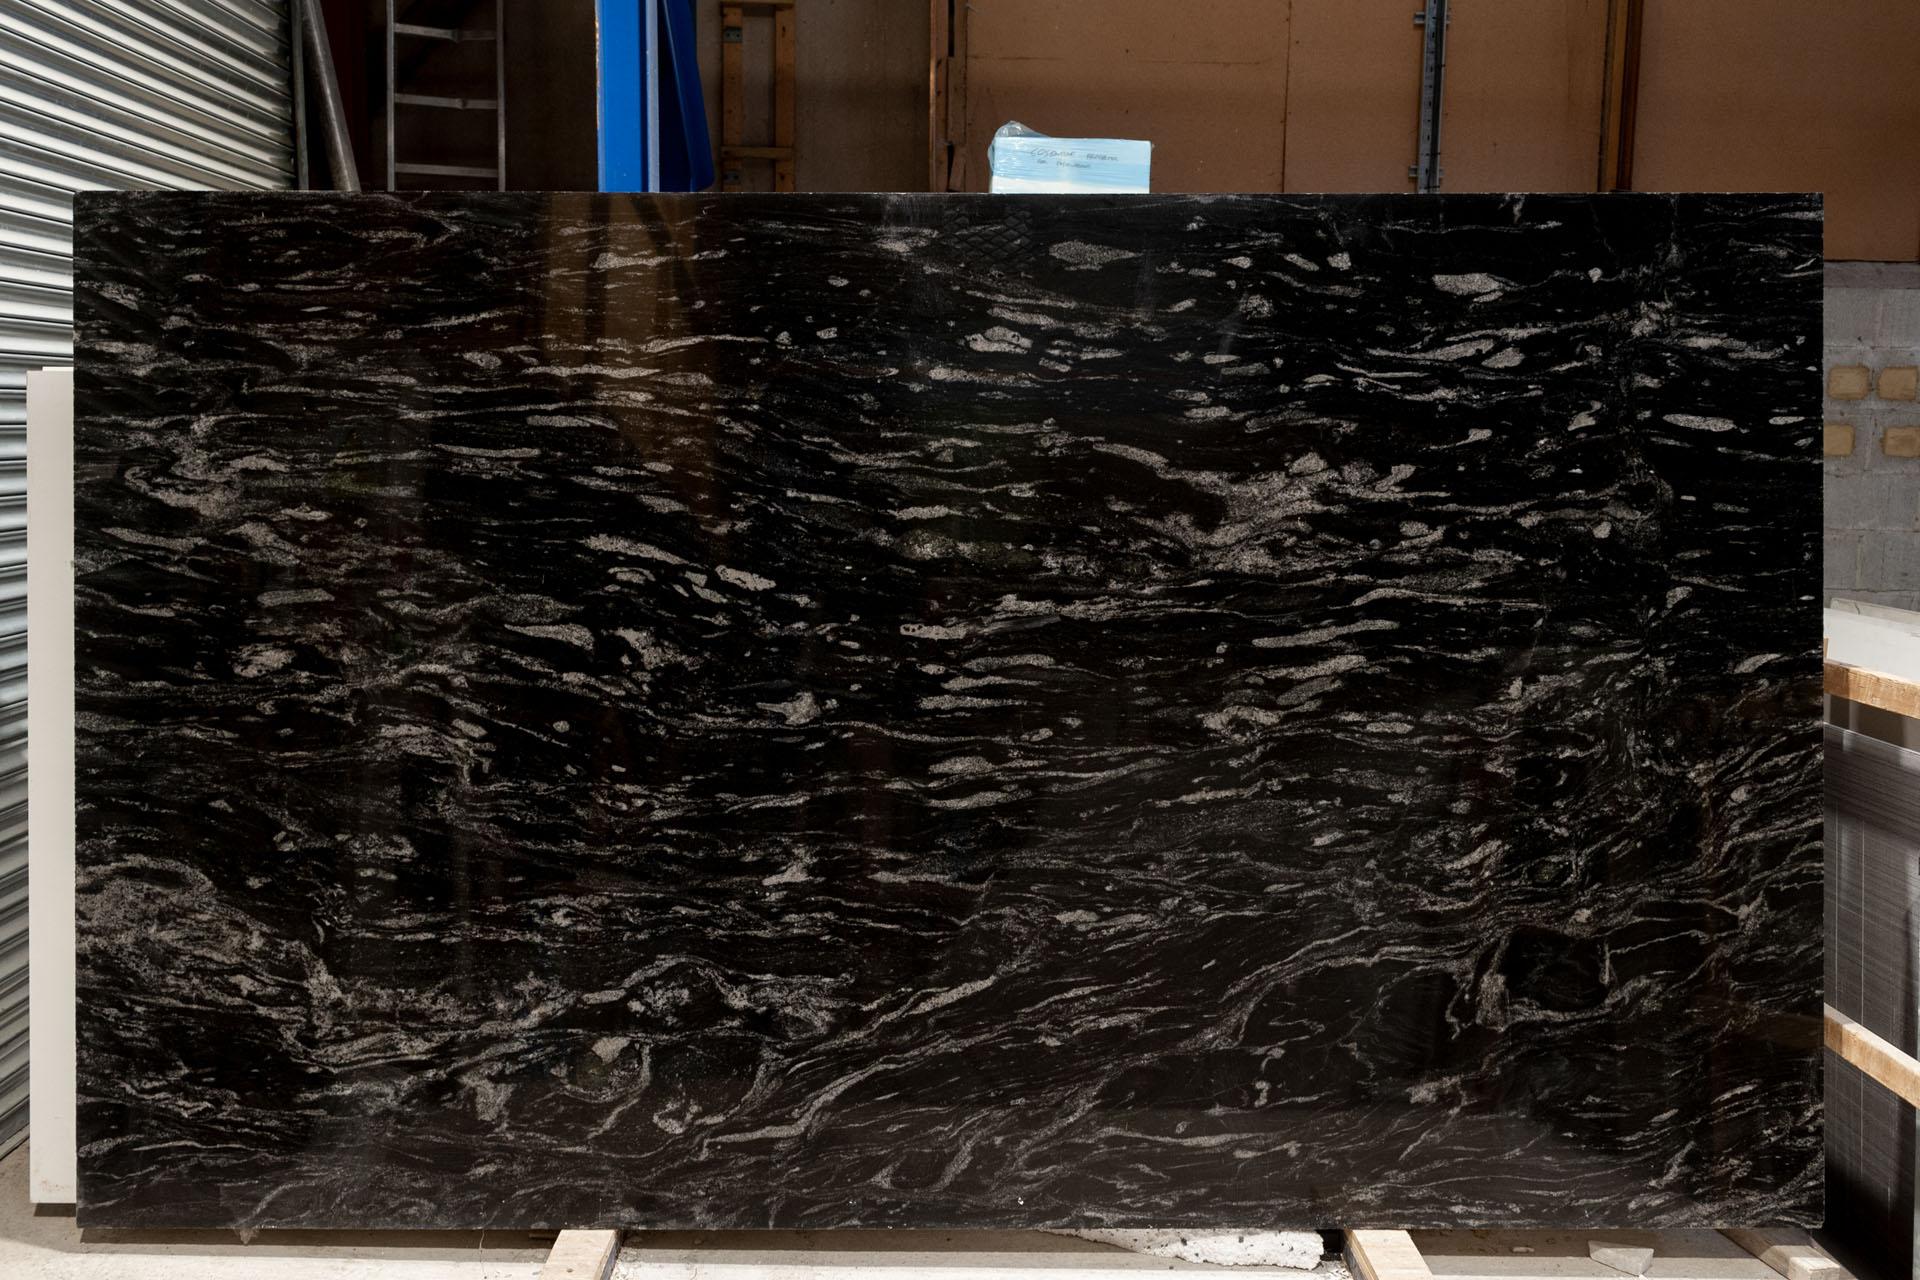 granite and quartz slabs Pretoria Granite MG181119 34457 110108 a